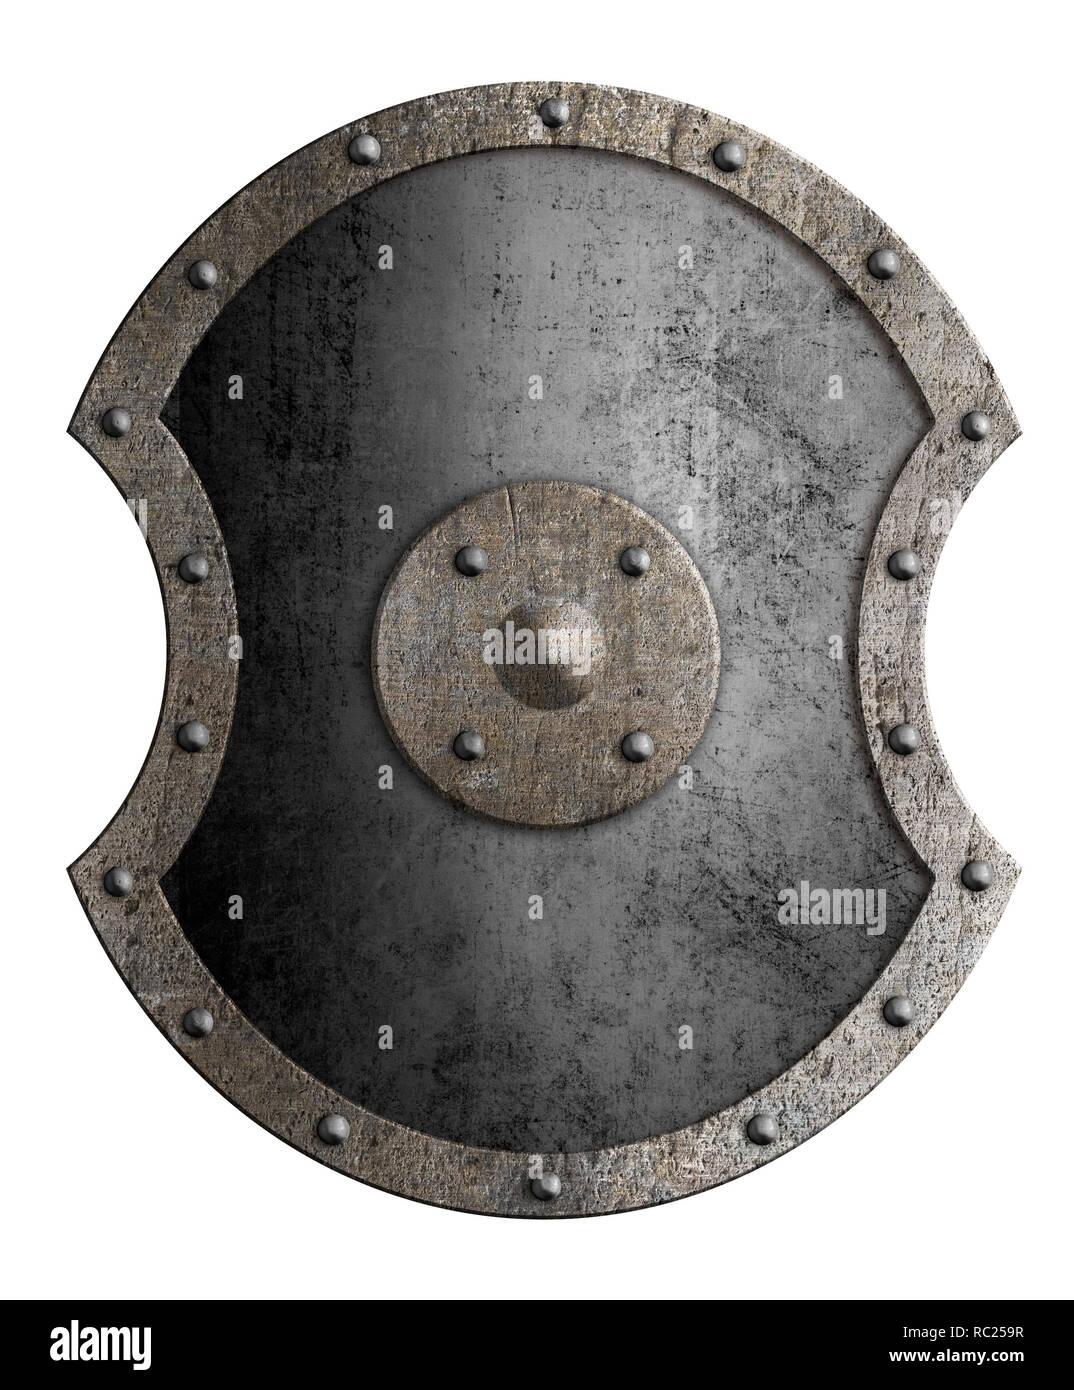 Große Metallplatte isoliert 3 Abbildung d Stockbild